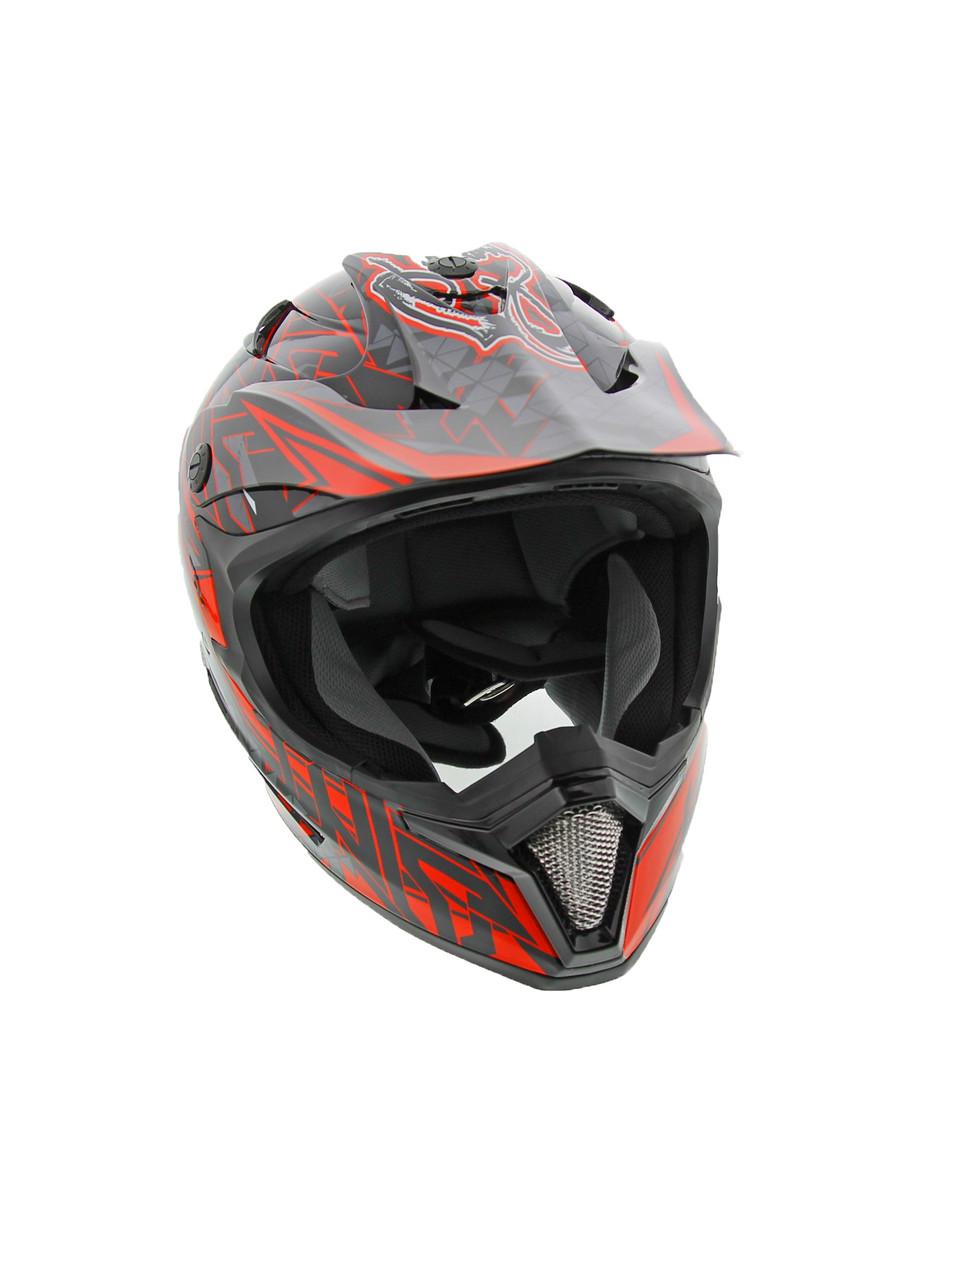 204110b8 ... Cyclone ATV MX Motocross Dirt Bike Off-Road Helmet DOT/ECE Approved- Red  · https://images.czchainsusa.com/wp-content/uploads/